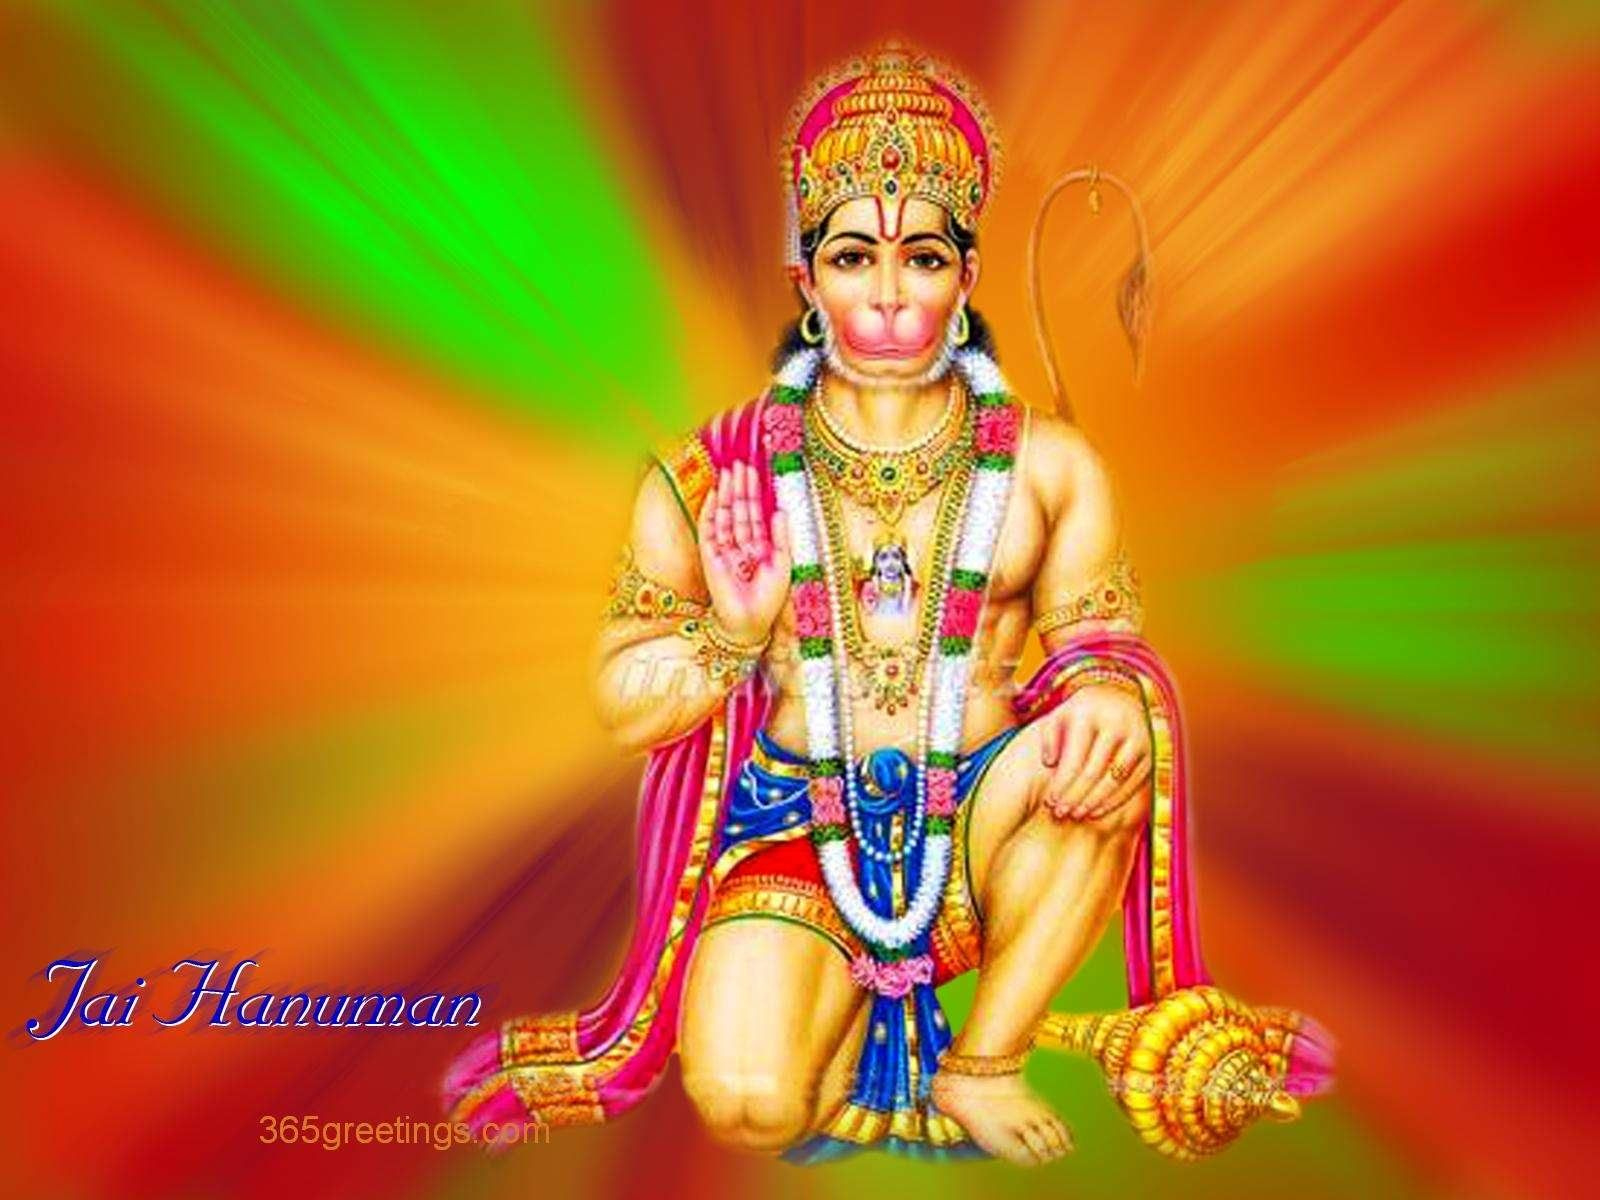 Wallpaper Hanuman Ji Full Size 67 Pictures Lord Hanuman Wallpapers Hanuman Photos Hanuman Images